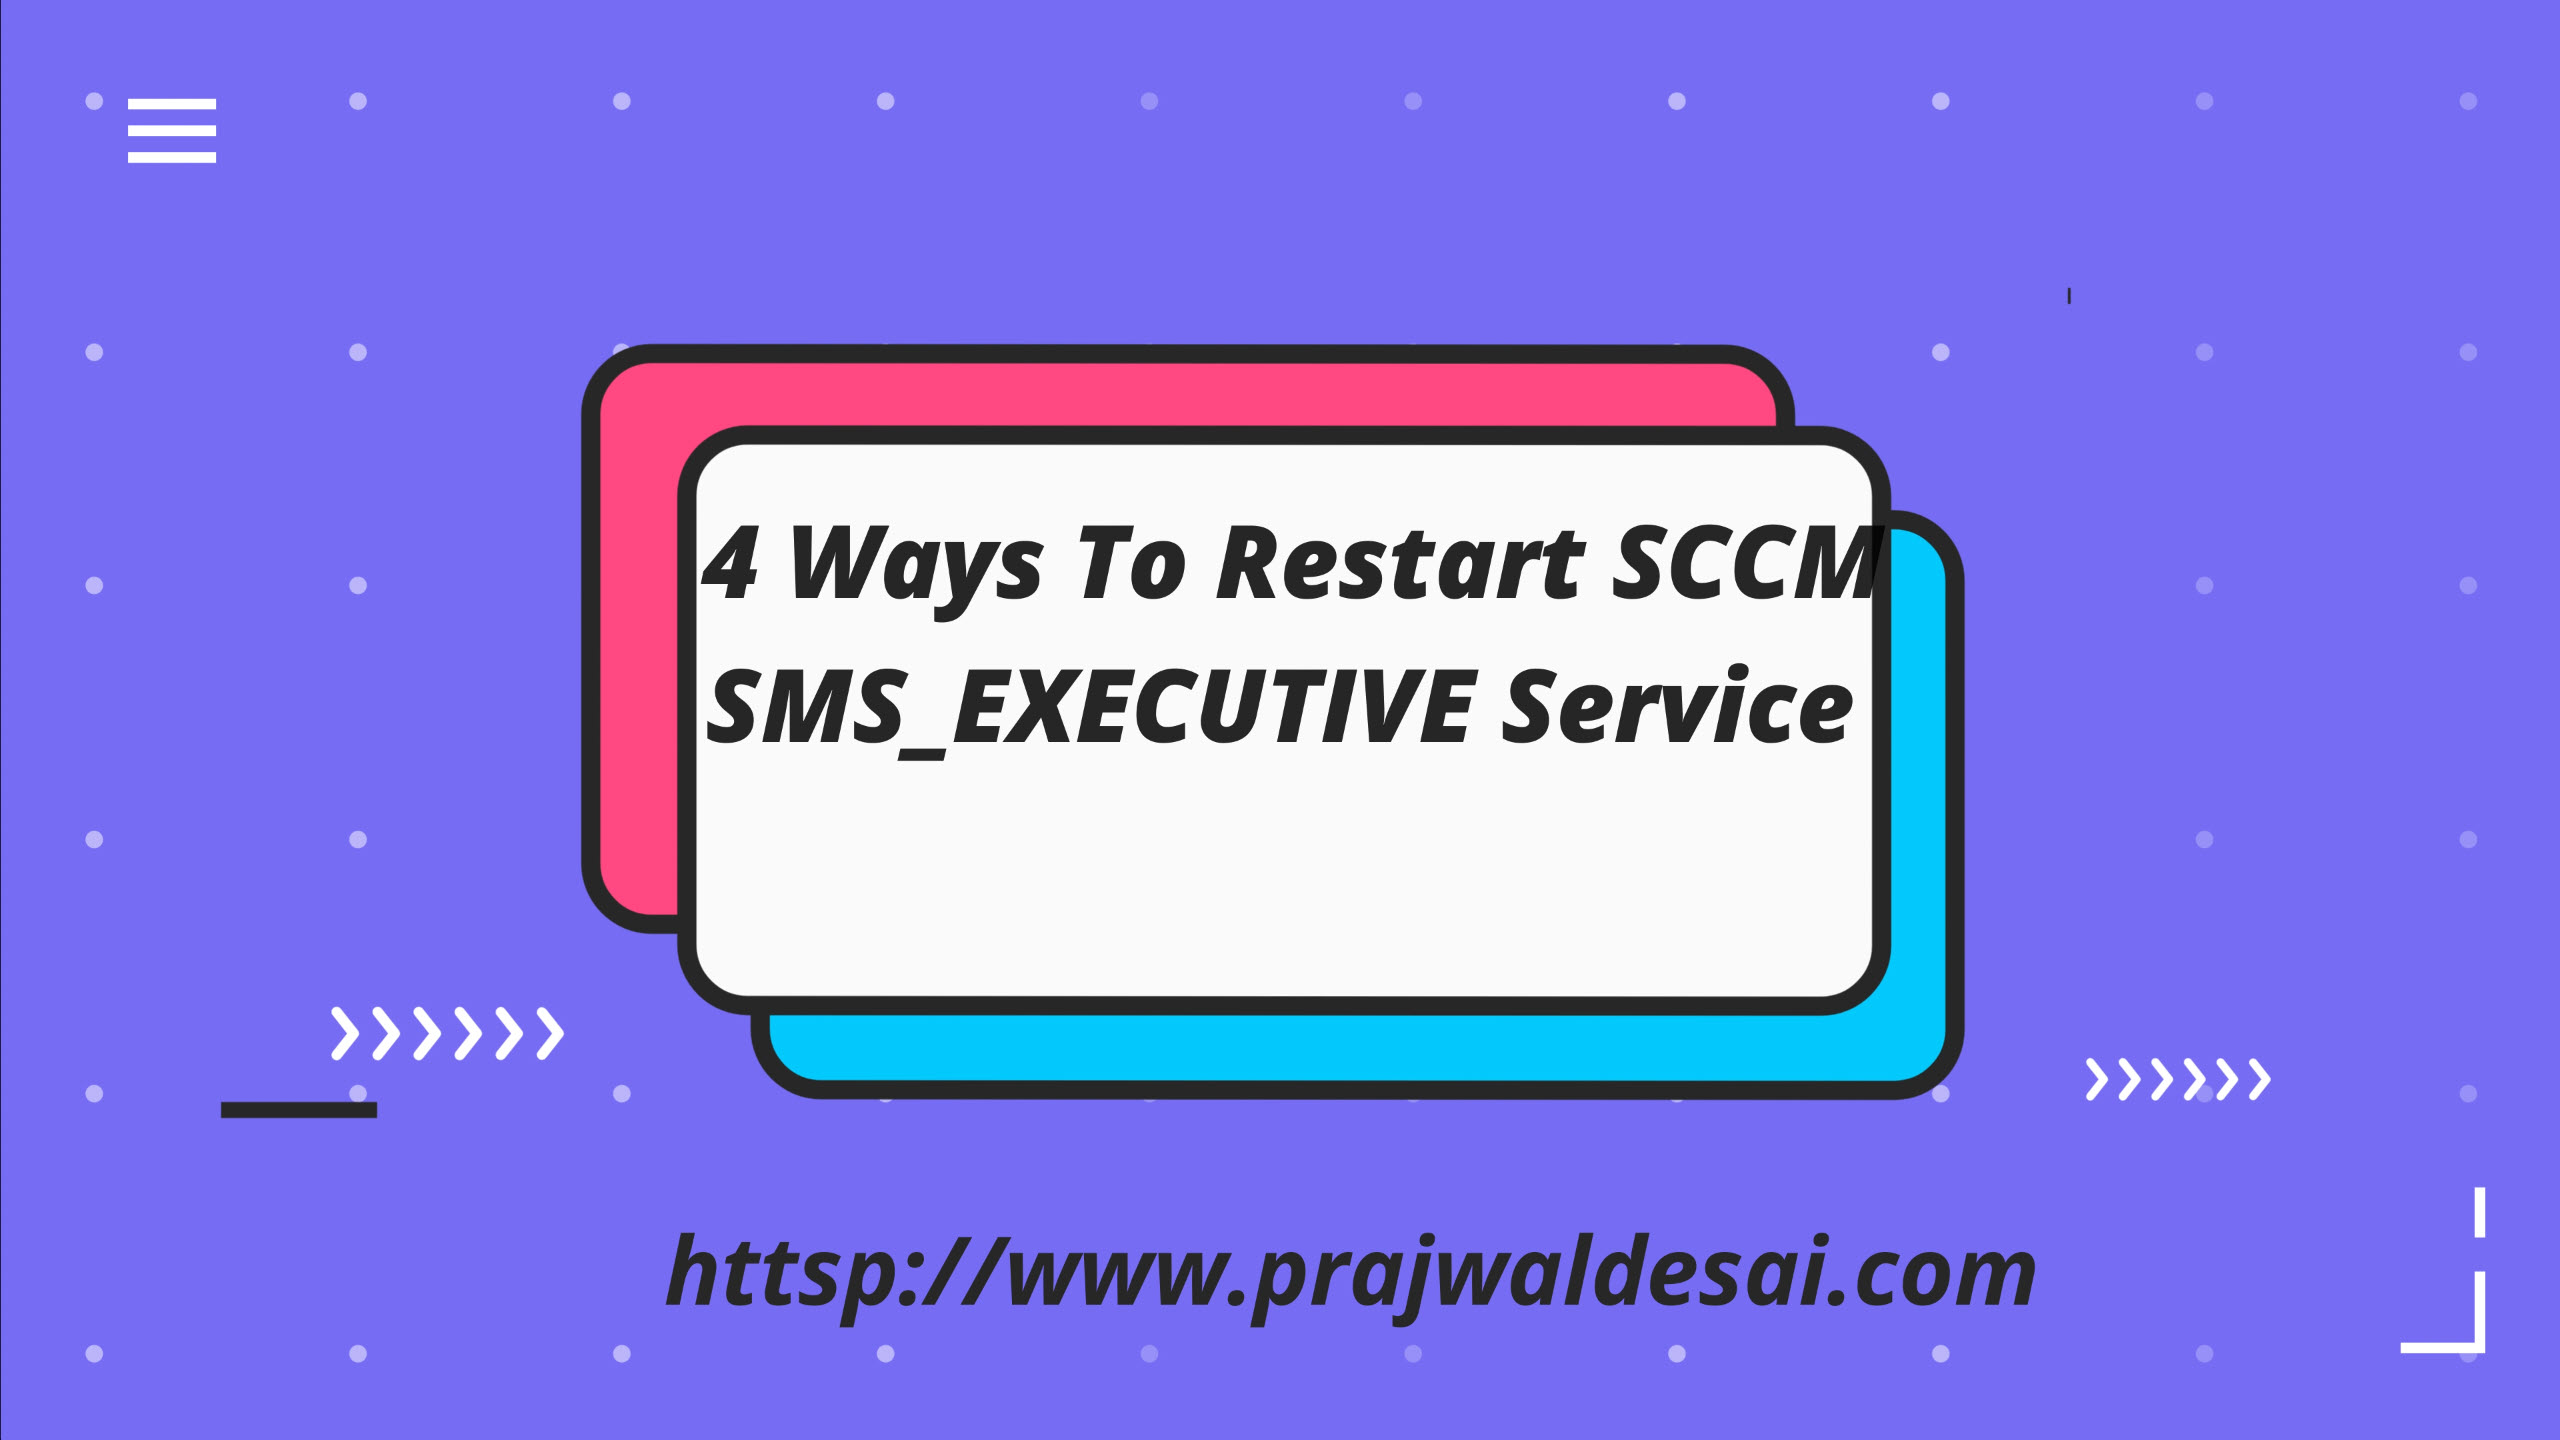 4 Ways to Restart SCCM SMS_EXECUTIVE Service